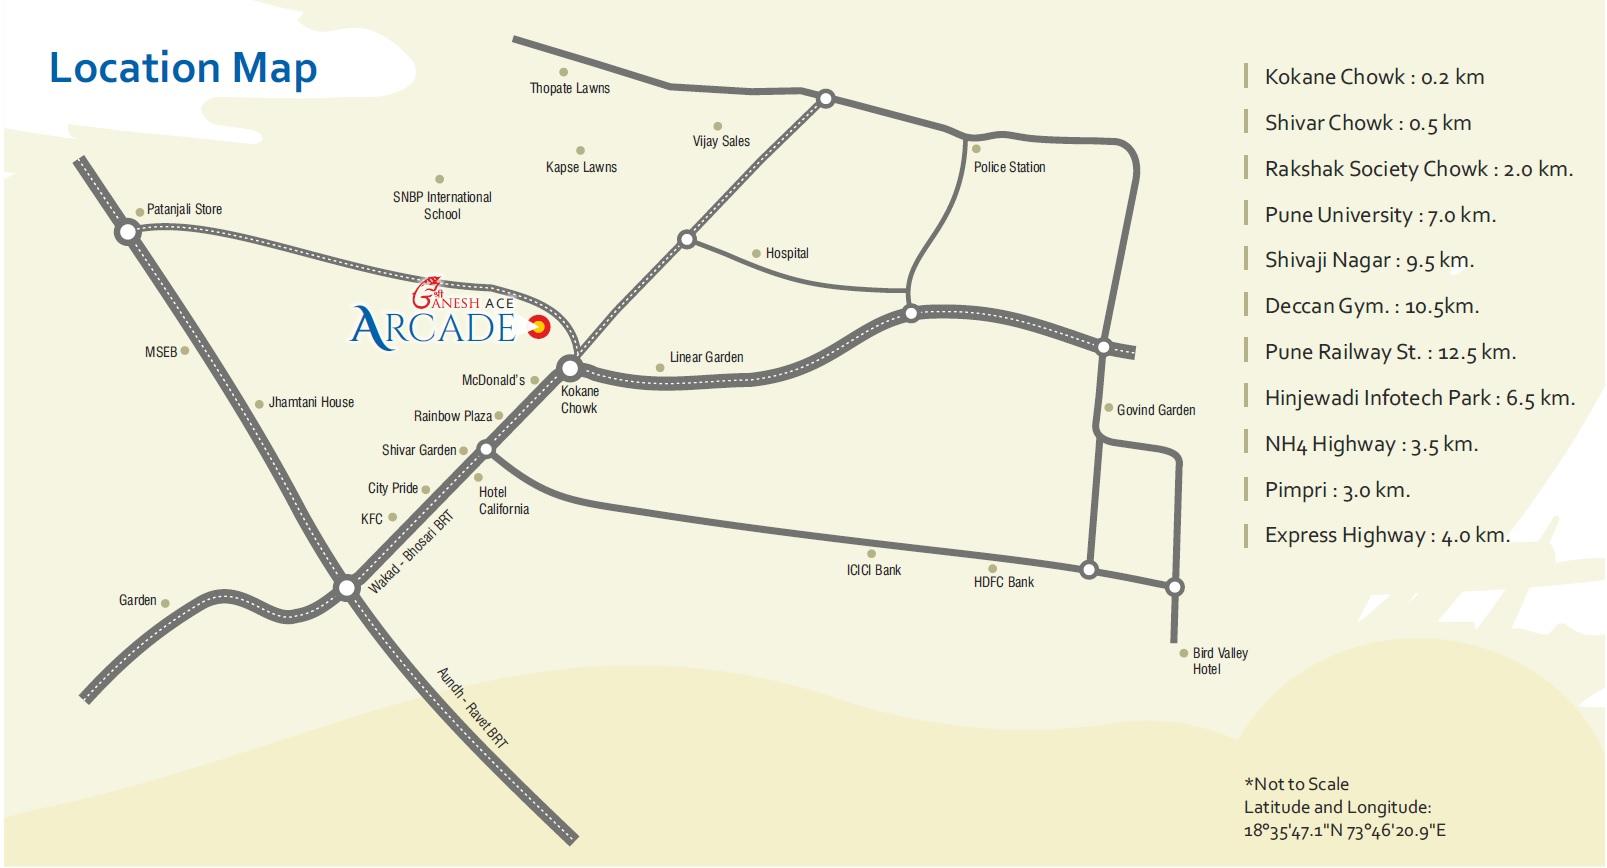 Ganesh-ace-arcade-location